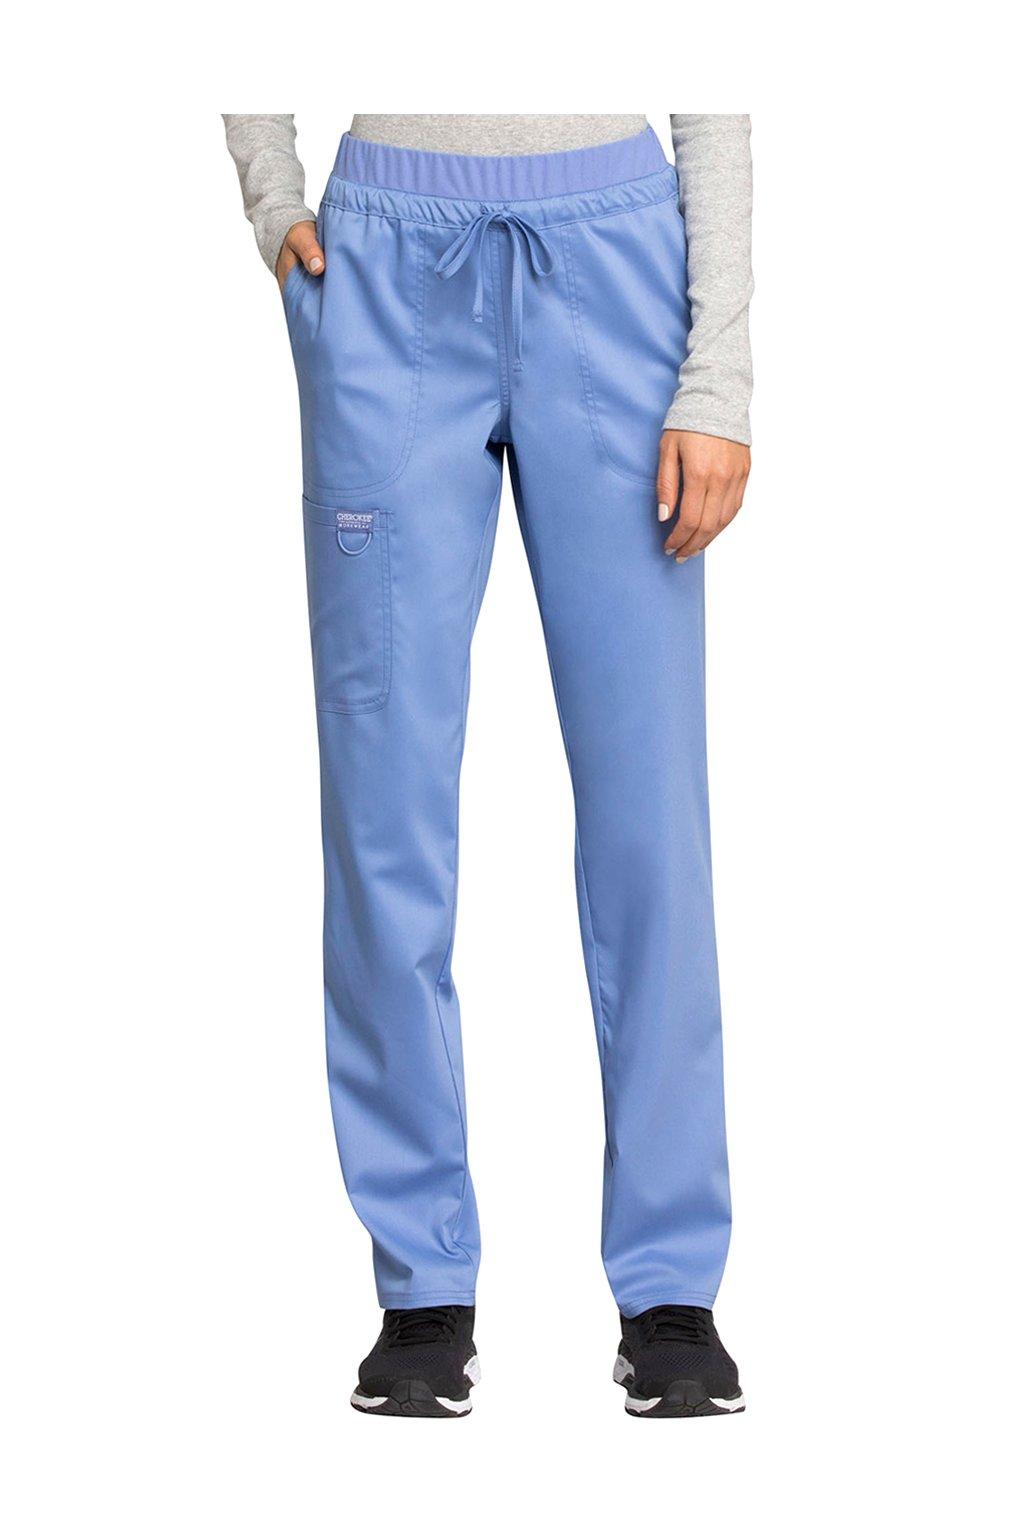 zdravotnicke-pracovni-kalhoty-cherokee-revolution-ww105-01